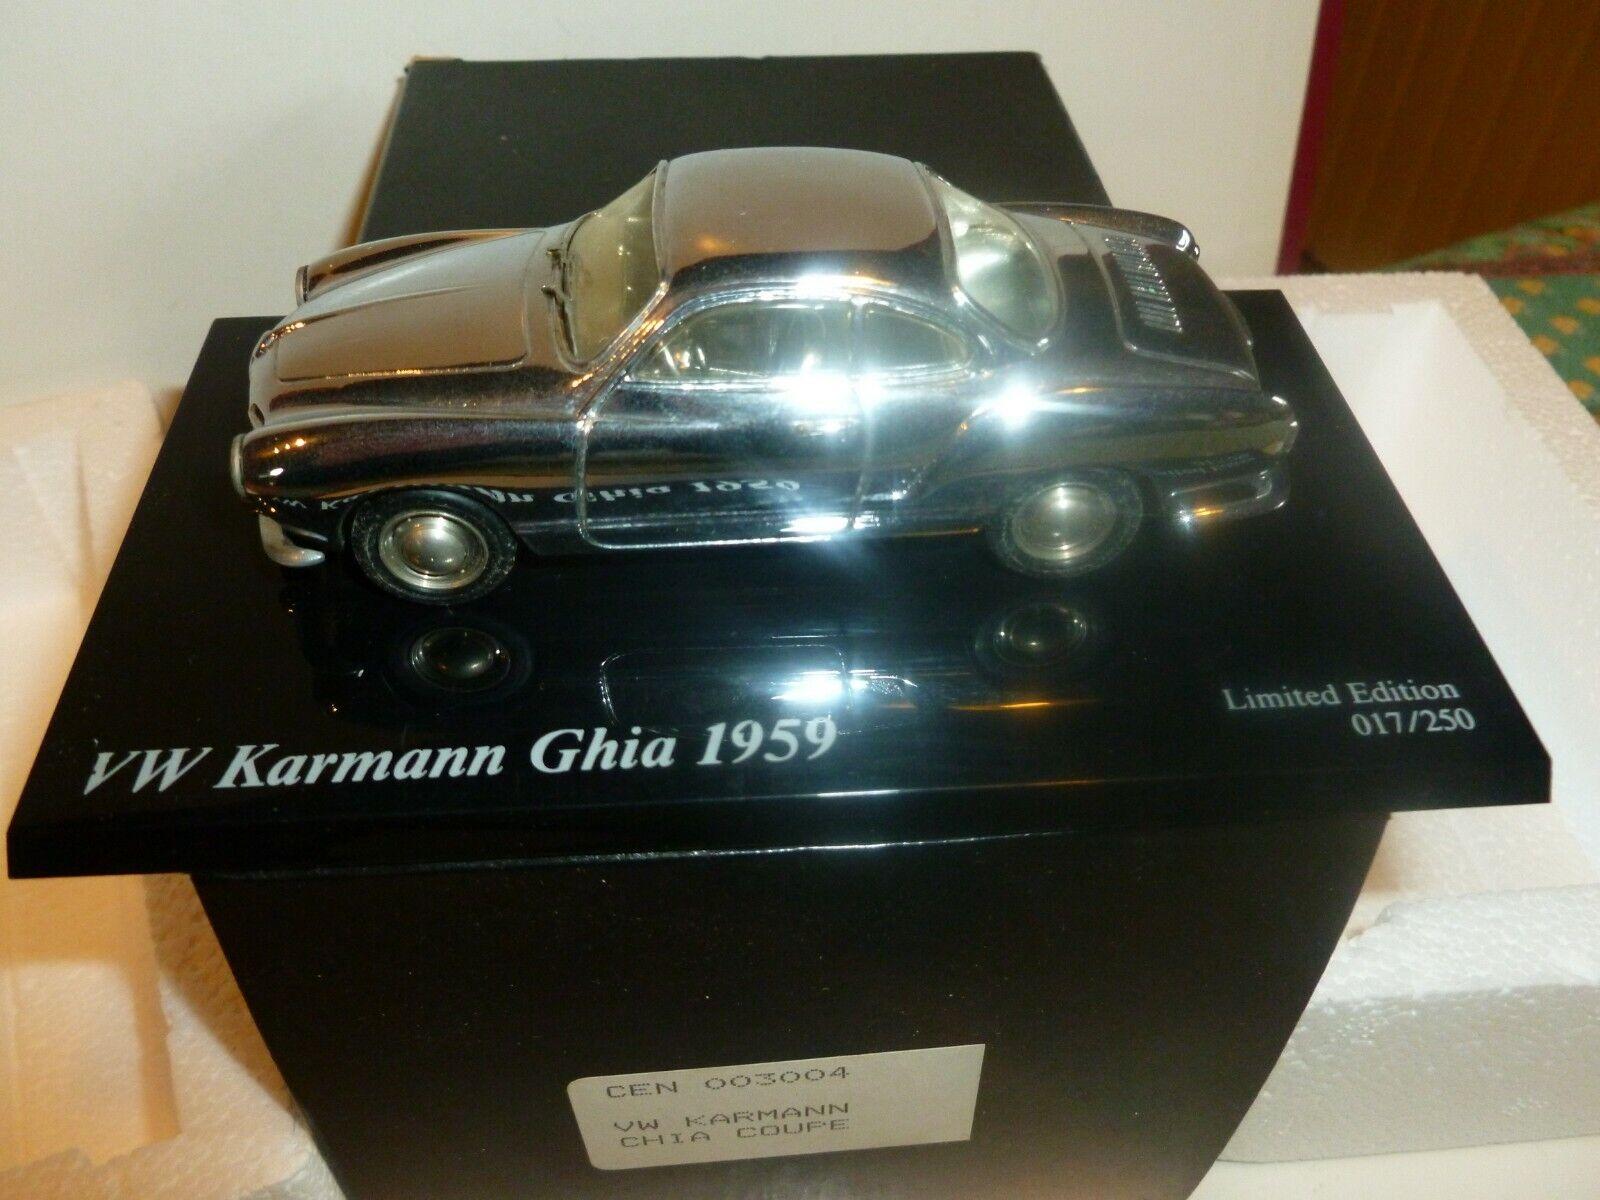 AMR CENTURY VW KARMANN GHIA 1959 COUPE ED LIMITEE  017 250 ETAT NEUF CHROME